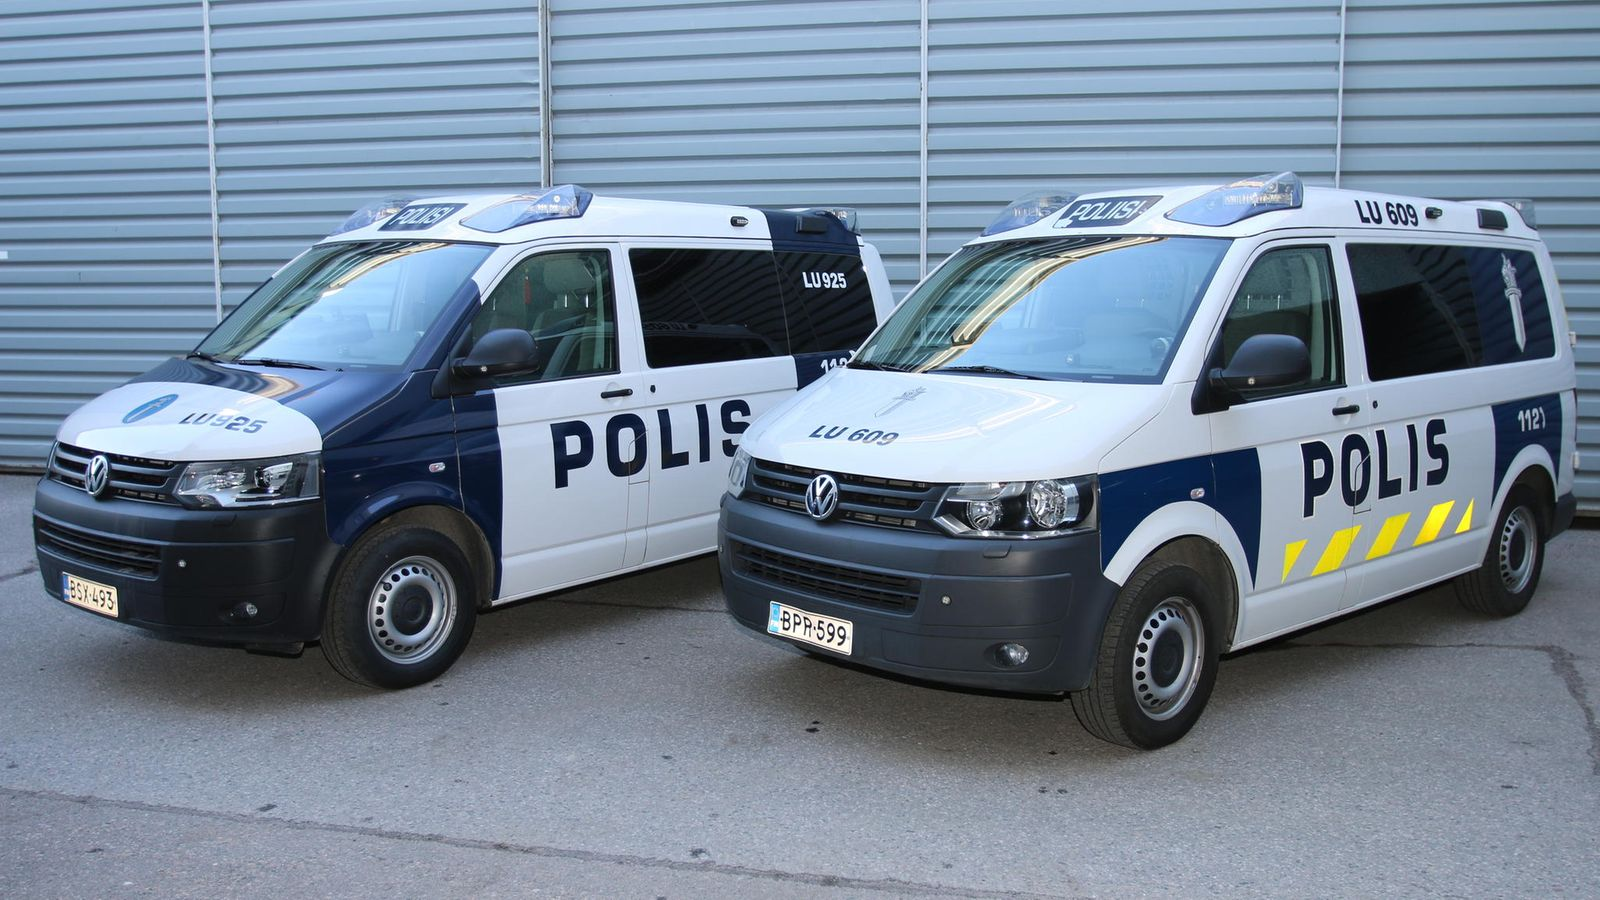 Poliisin